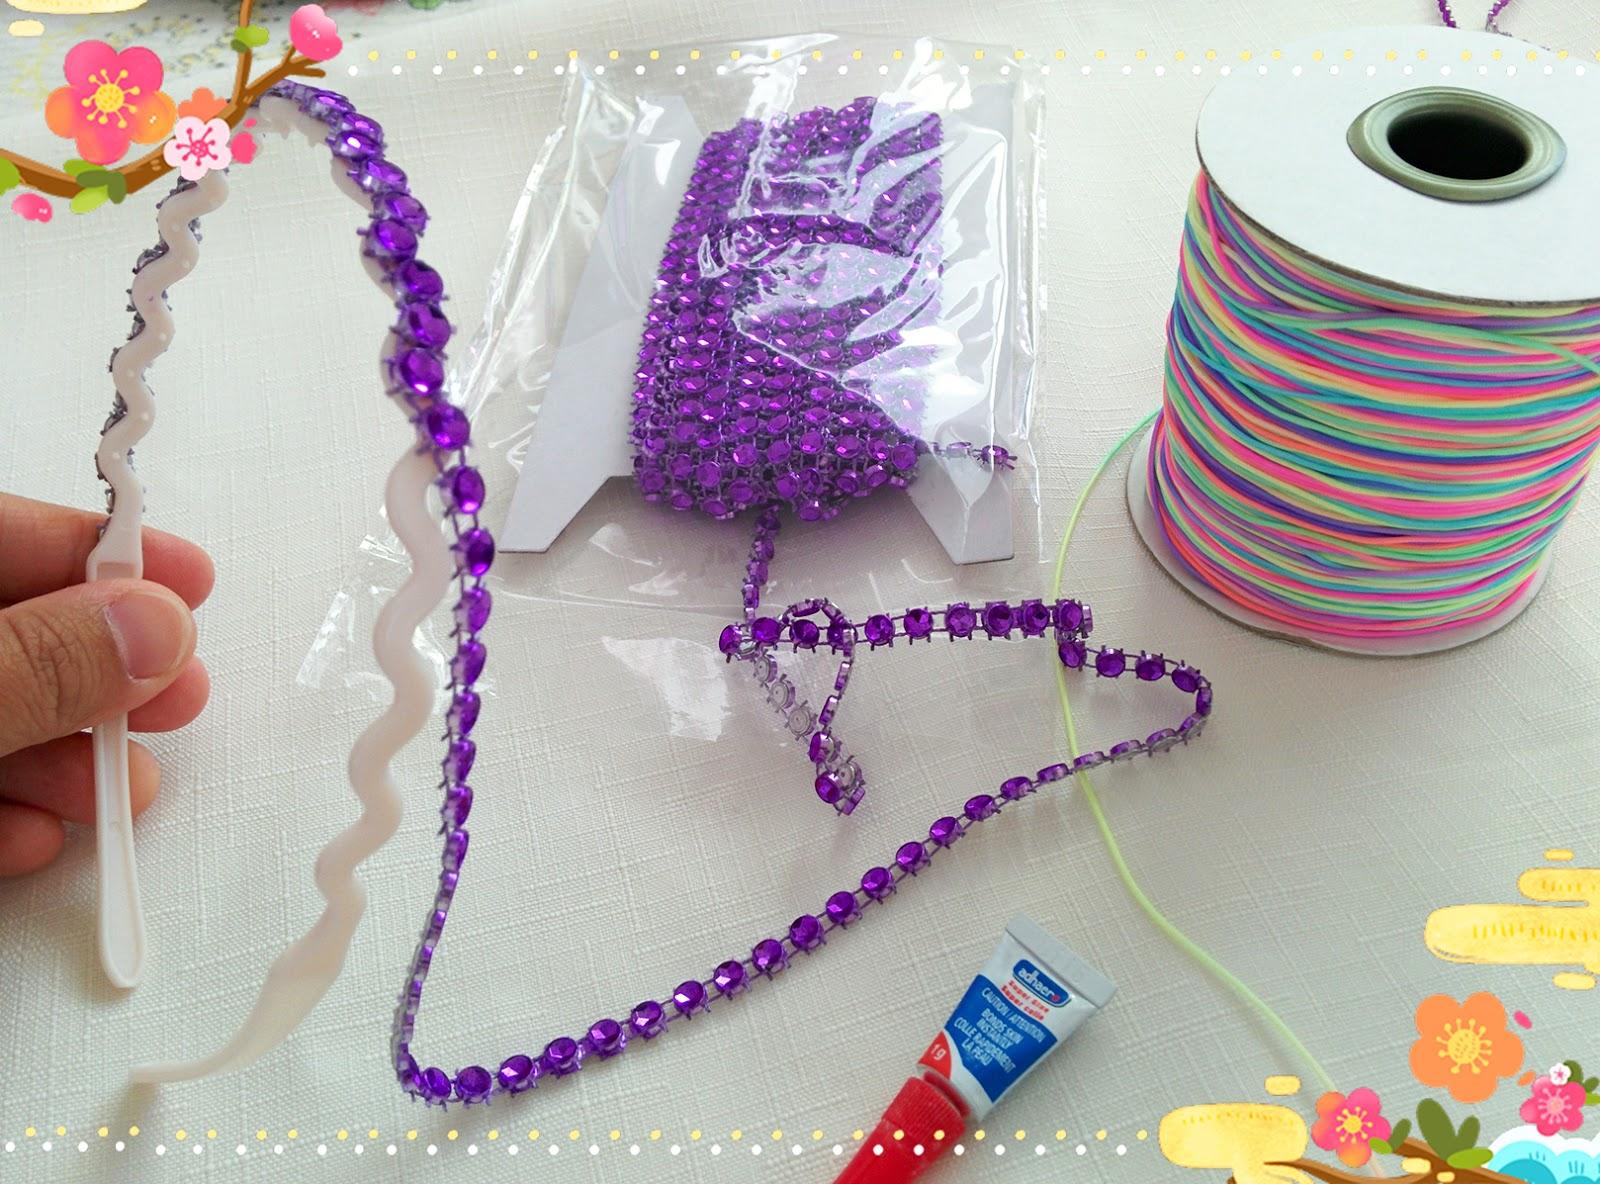 AuRa Treasury  DIY - How to make Rhinestone Headband by using ... cd6e110087c